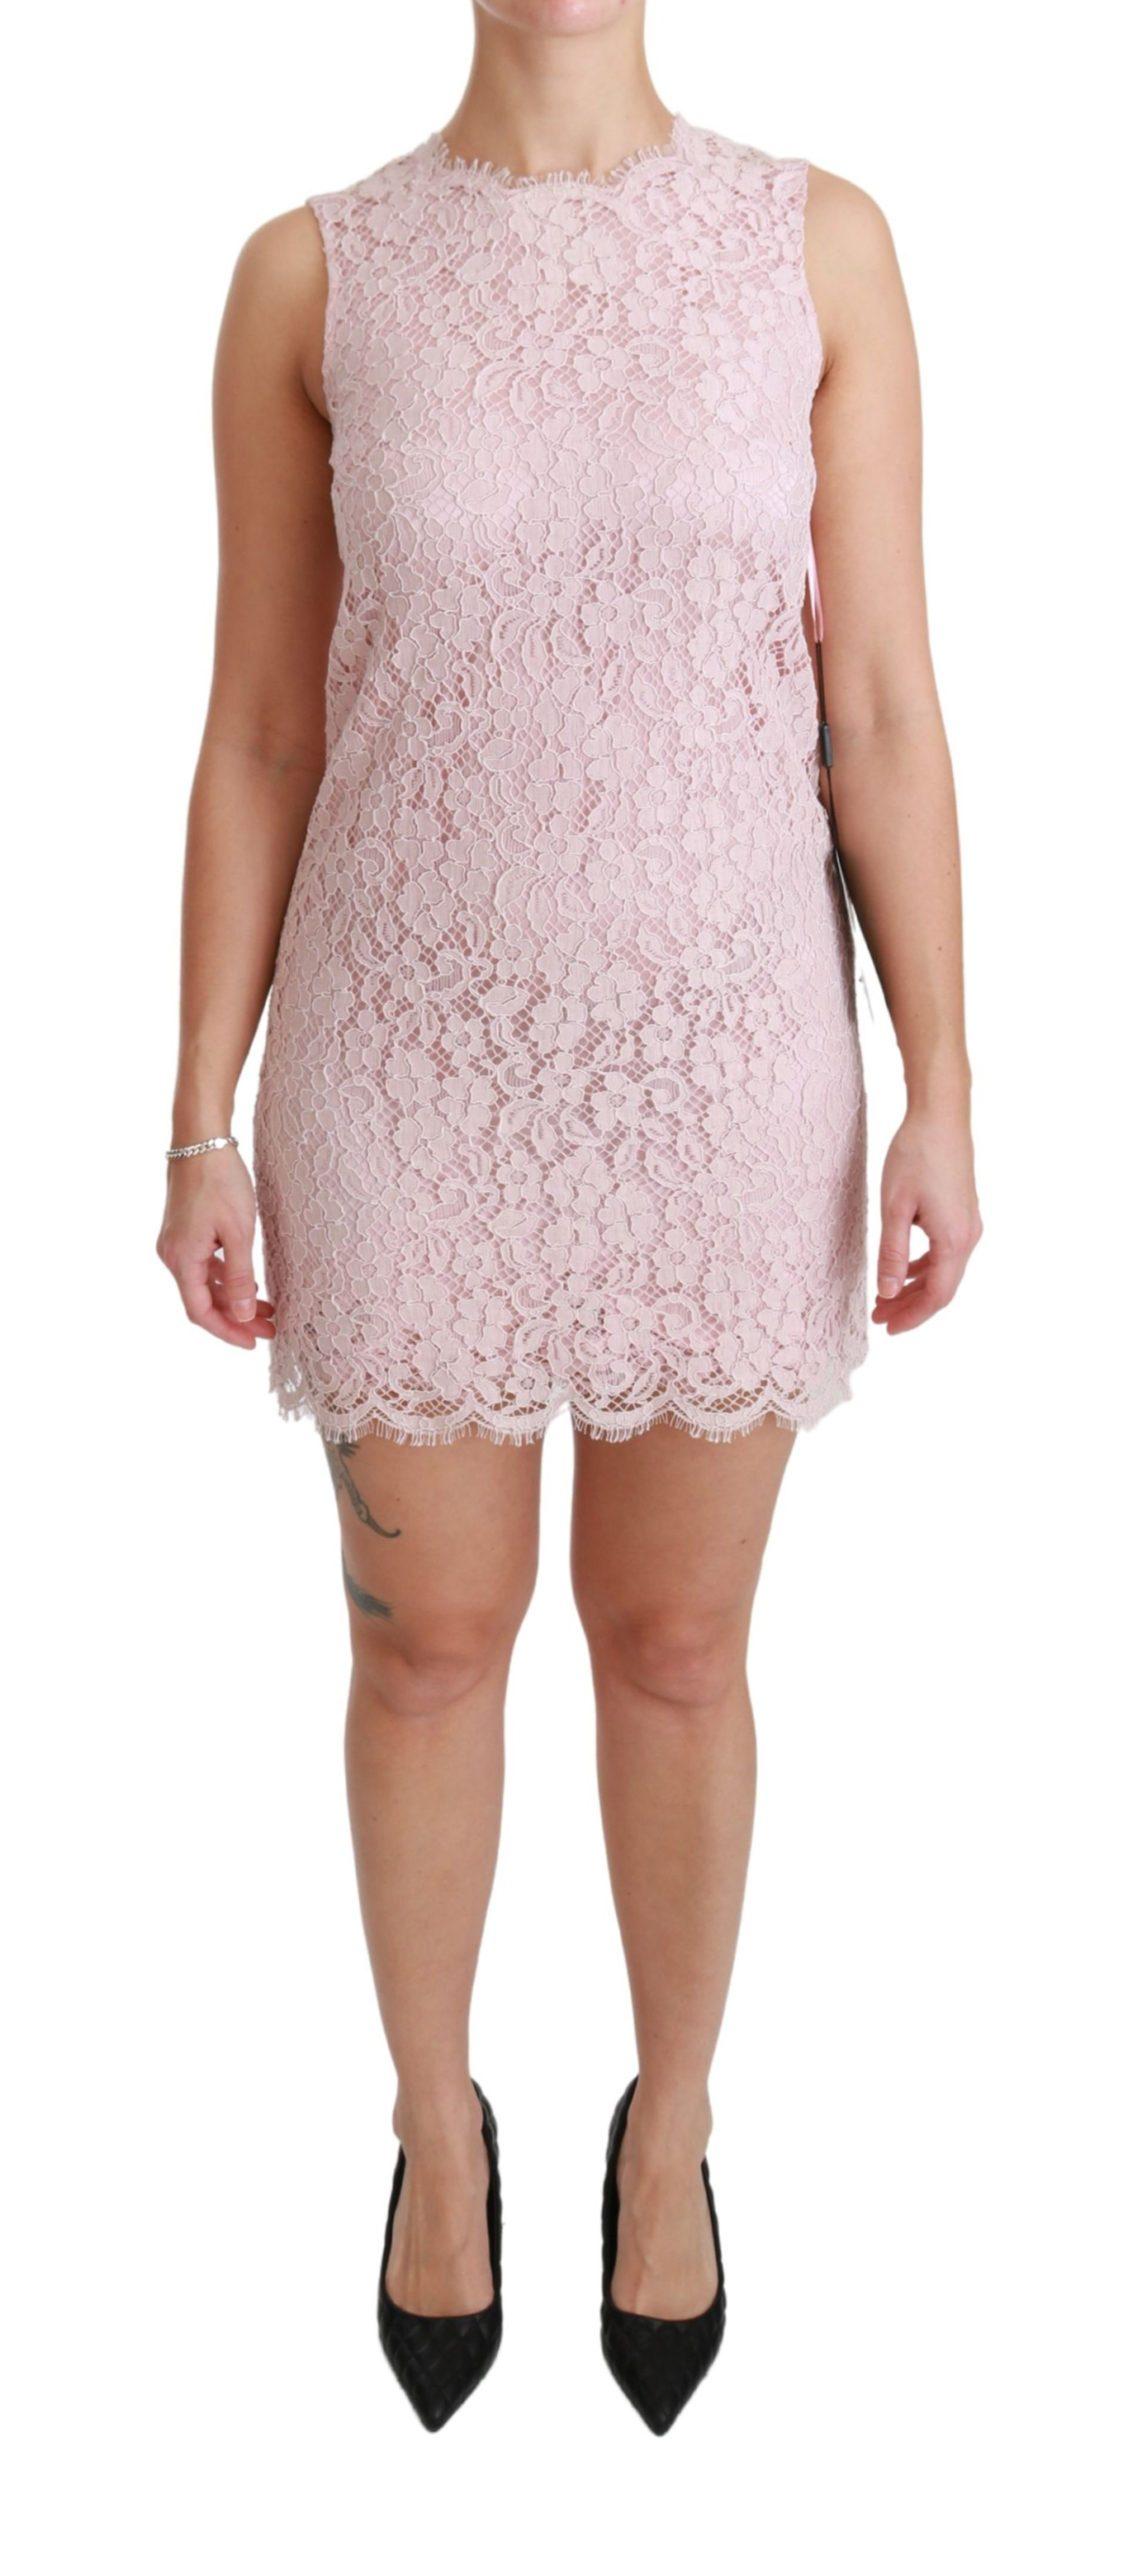 Dolce & Gabbana Women's Floral Lace Shift Gown Mini Dress Pink DR2464 - IT38 XS